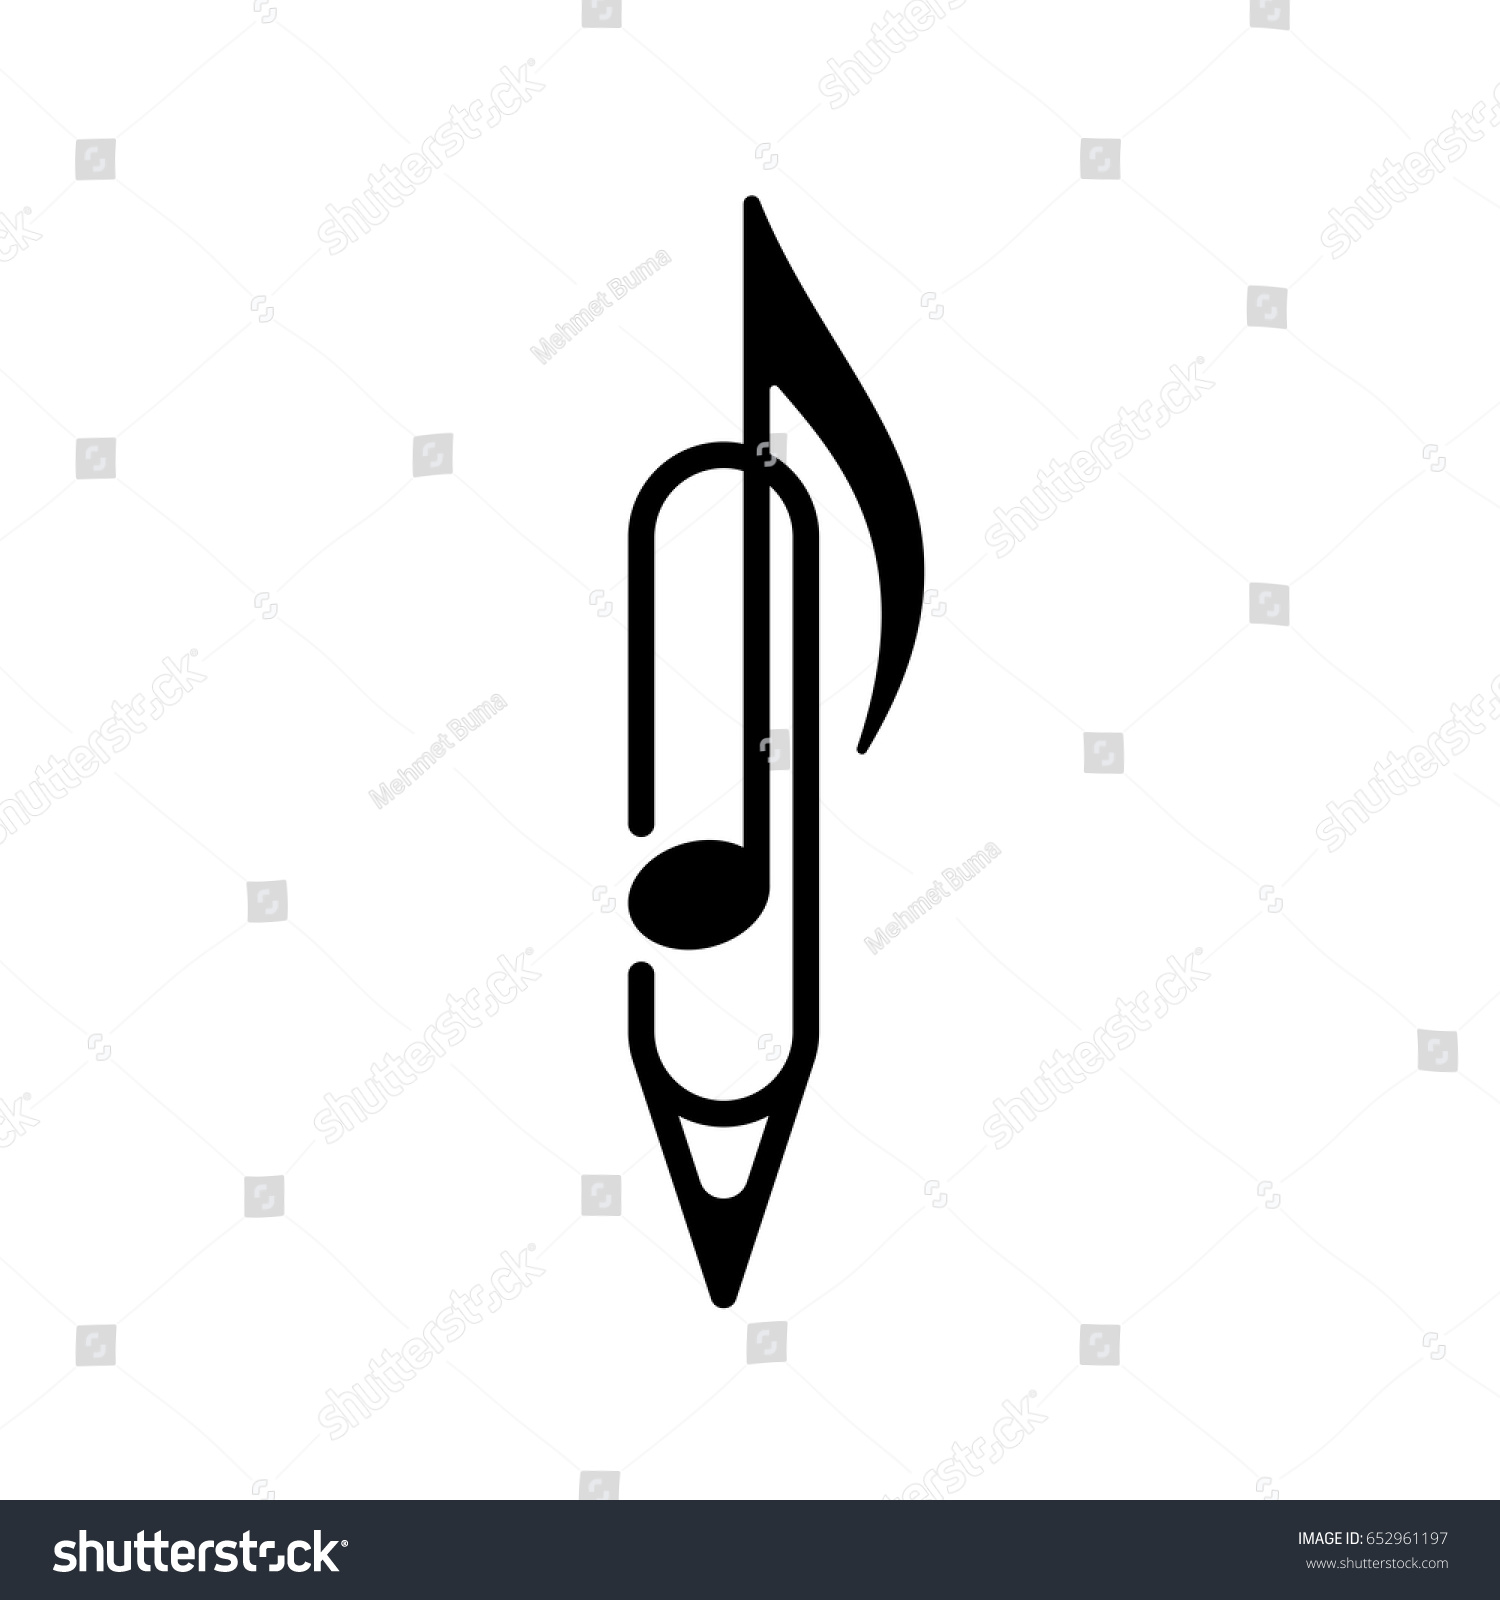 logo design music note pen paper stock vector 652961197 shutterstock